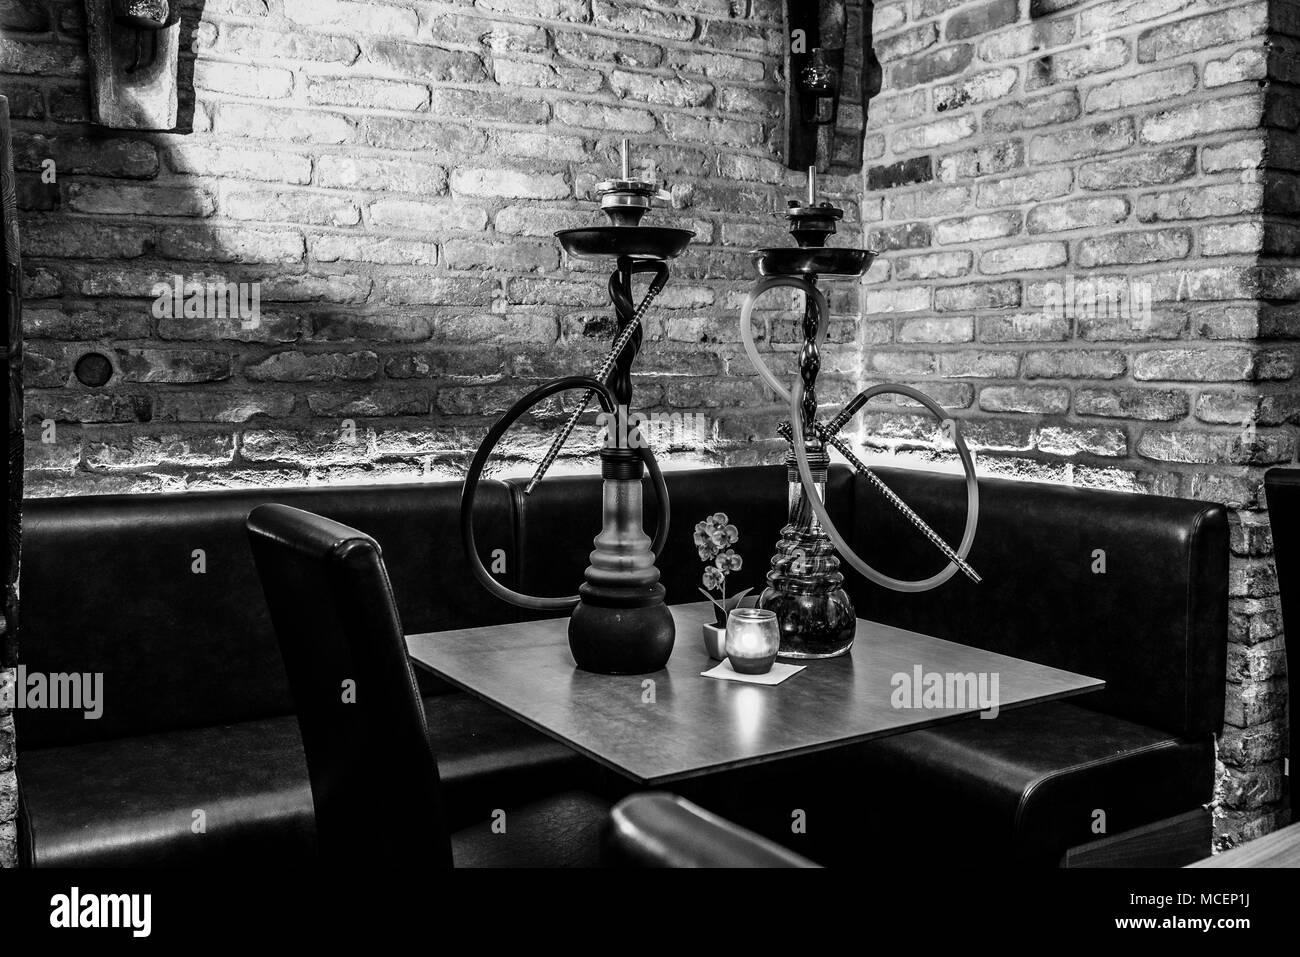 Hookah lounge stock photos hookah lounge stock images - Shisha bar lounge mobel ...